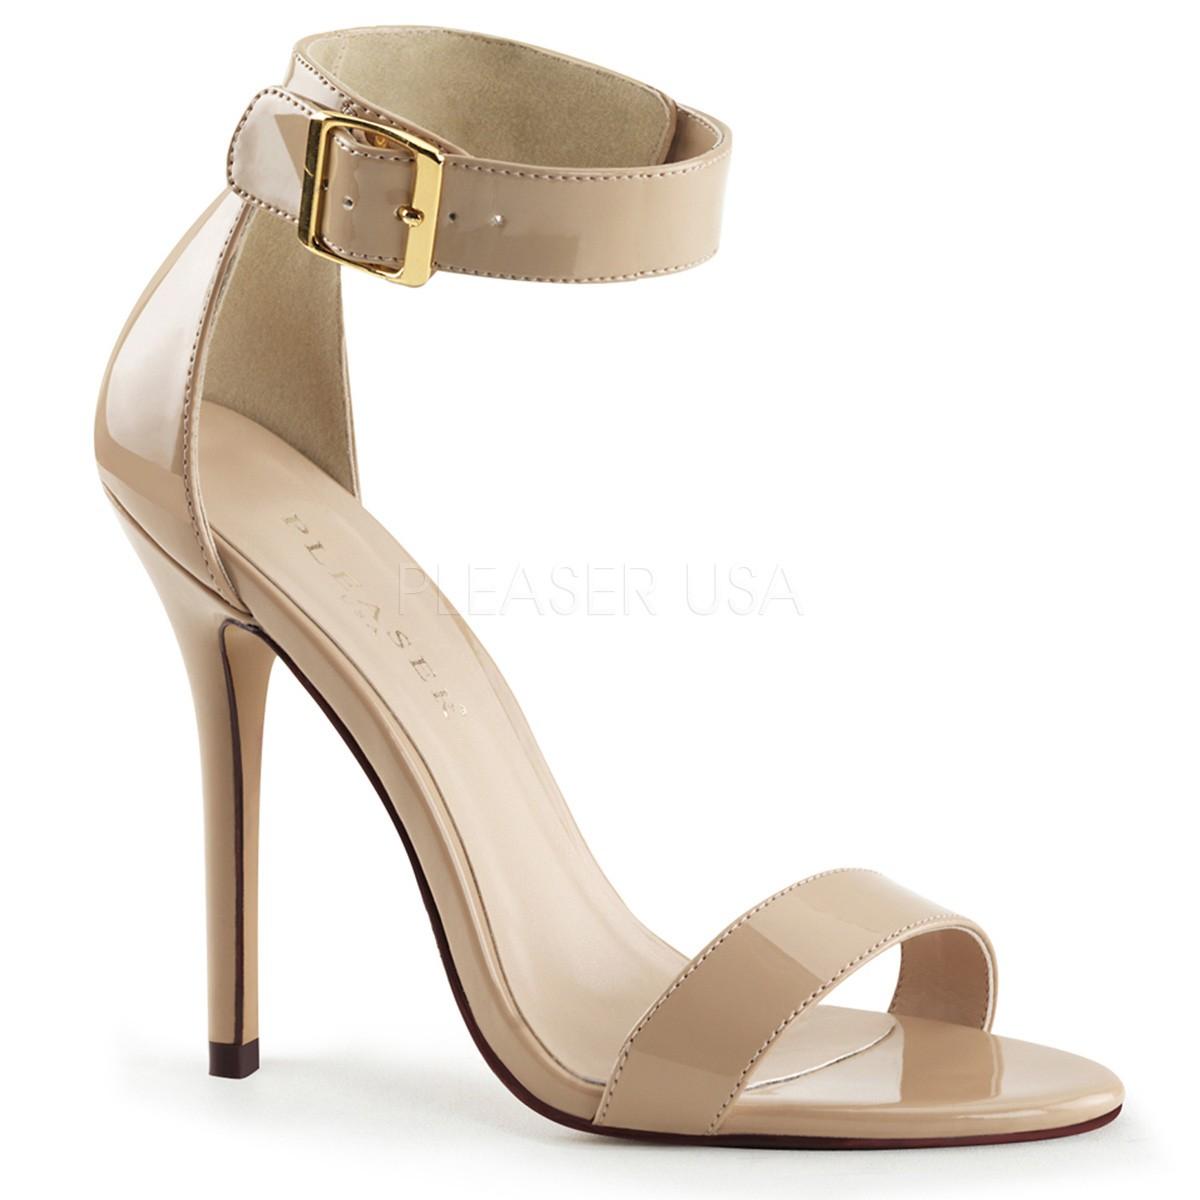 chaussure femme sandale talon. Black Bedroom Furniture Sets. Home Design Ideas